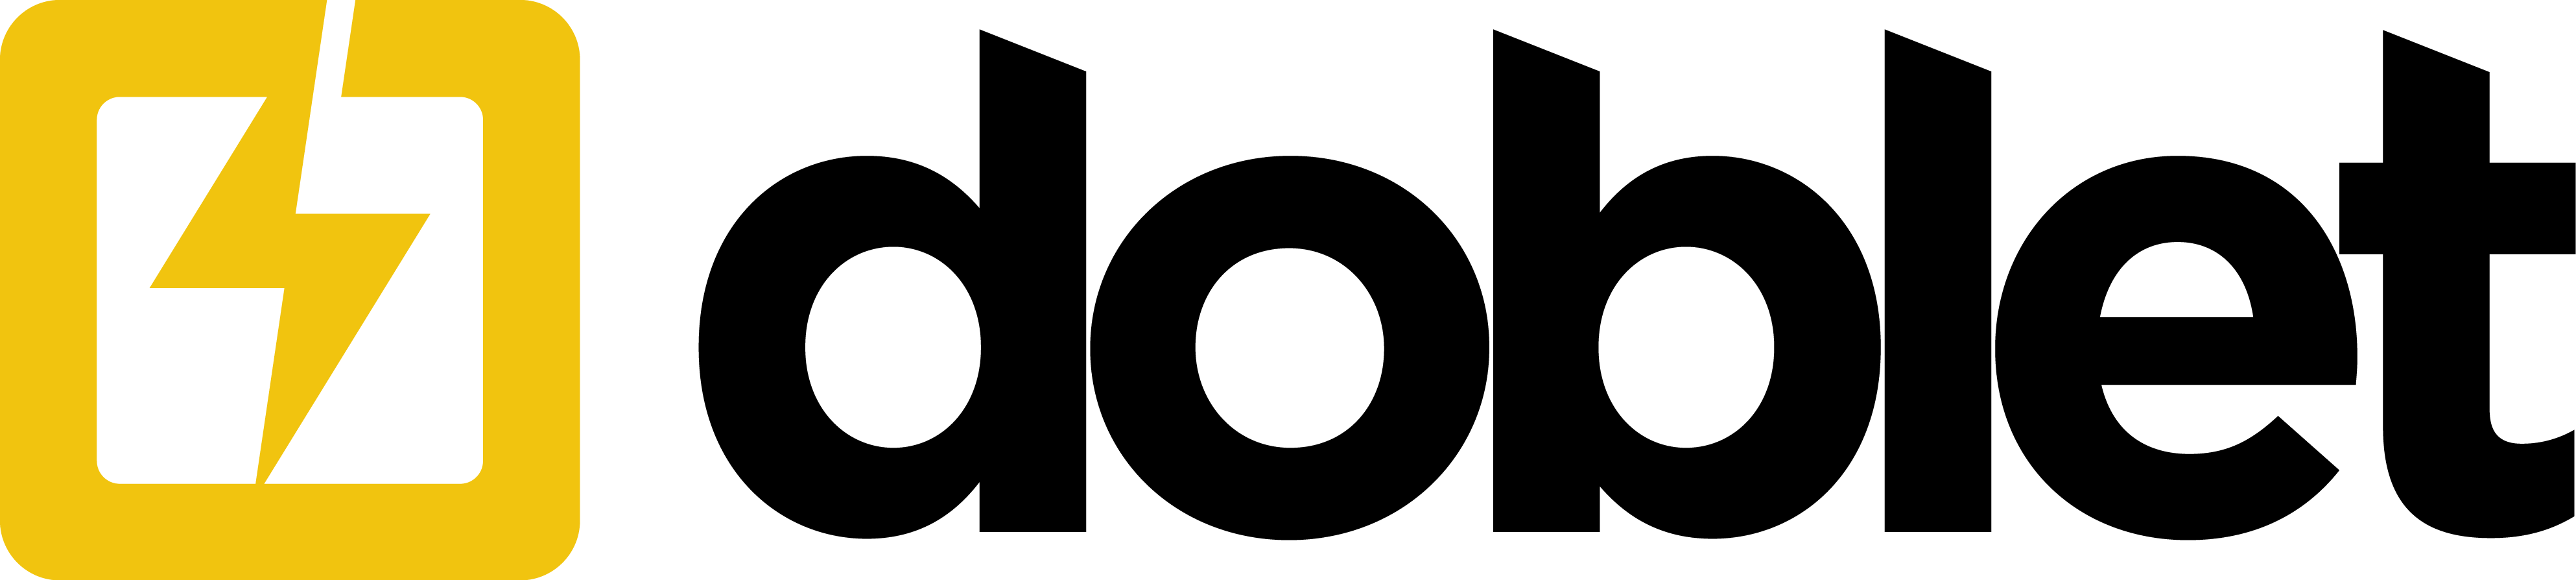 doblet-logo-san-francisco